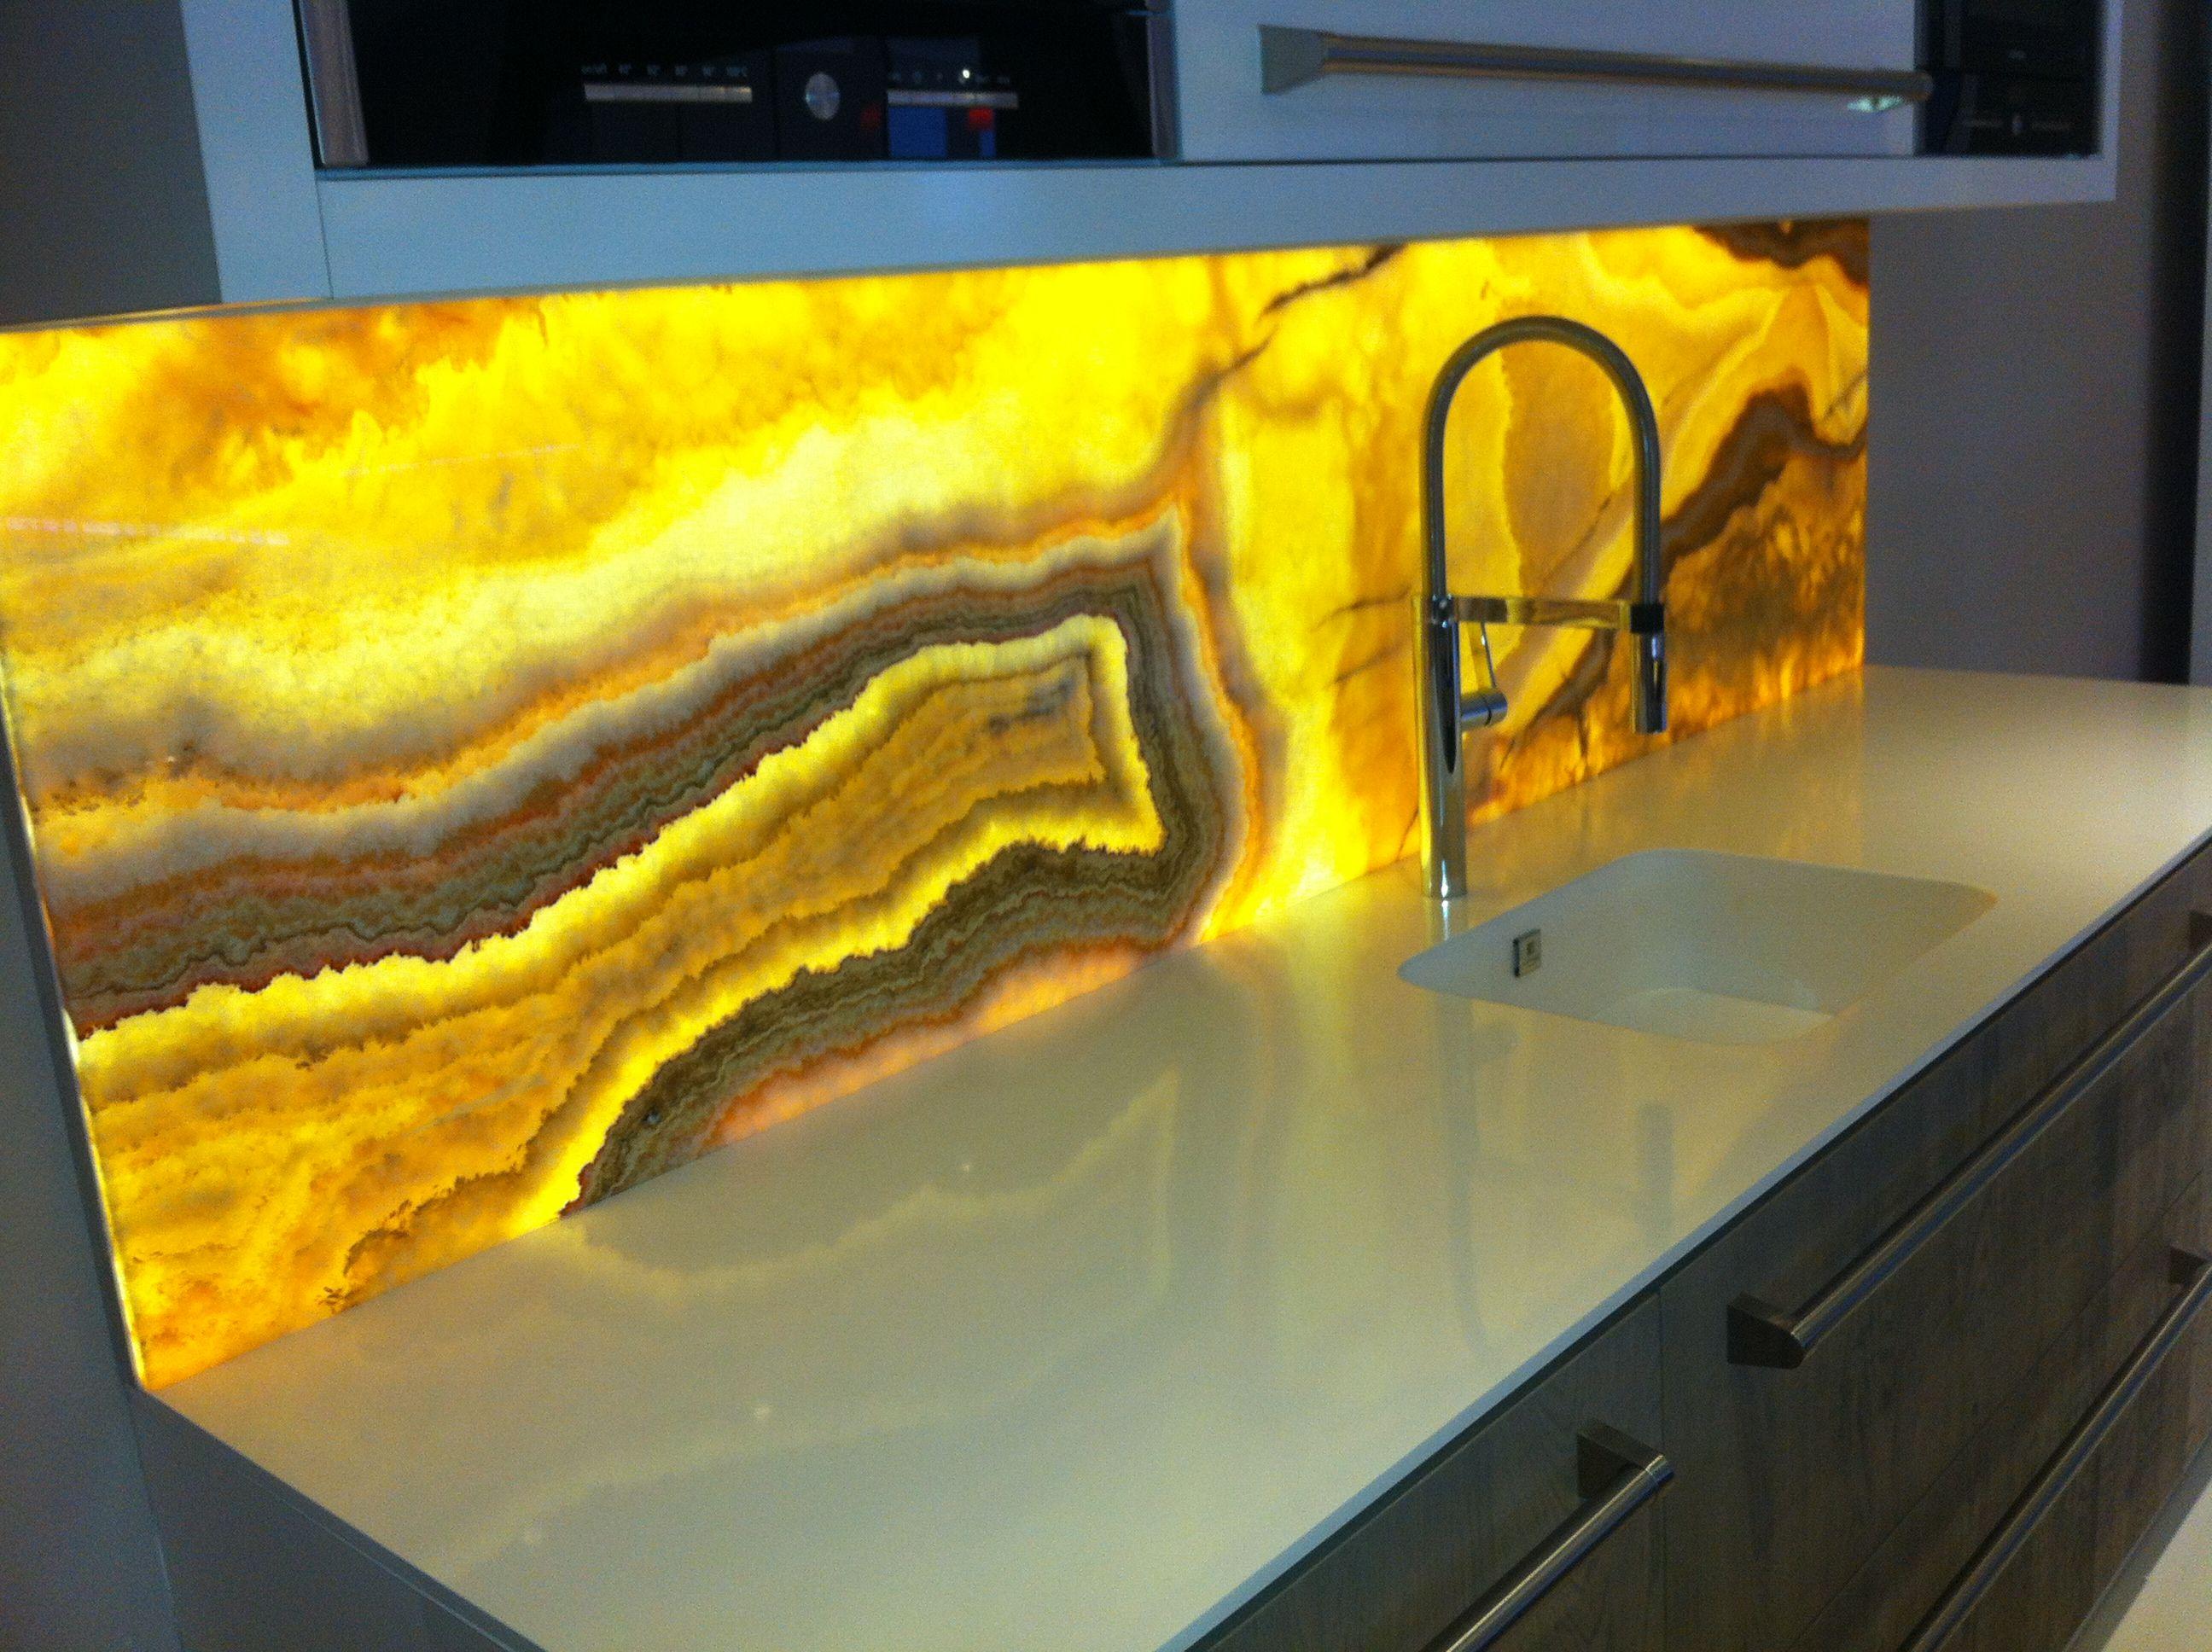 LEDison illuminated kitchen splashback | Glass kitchen splashbacks ...